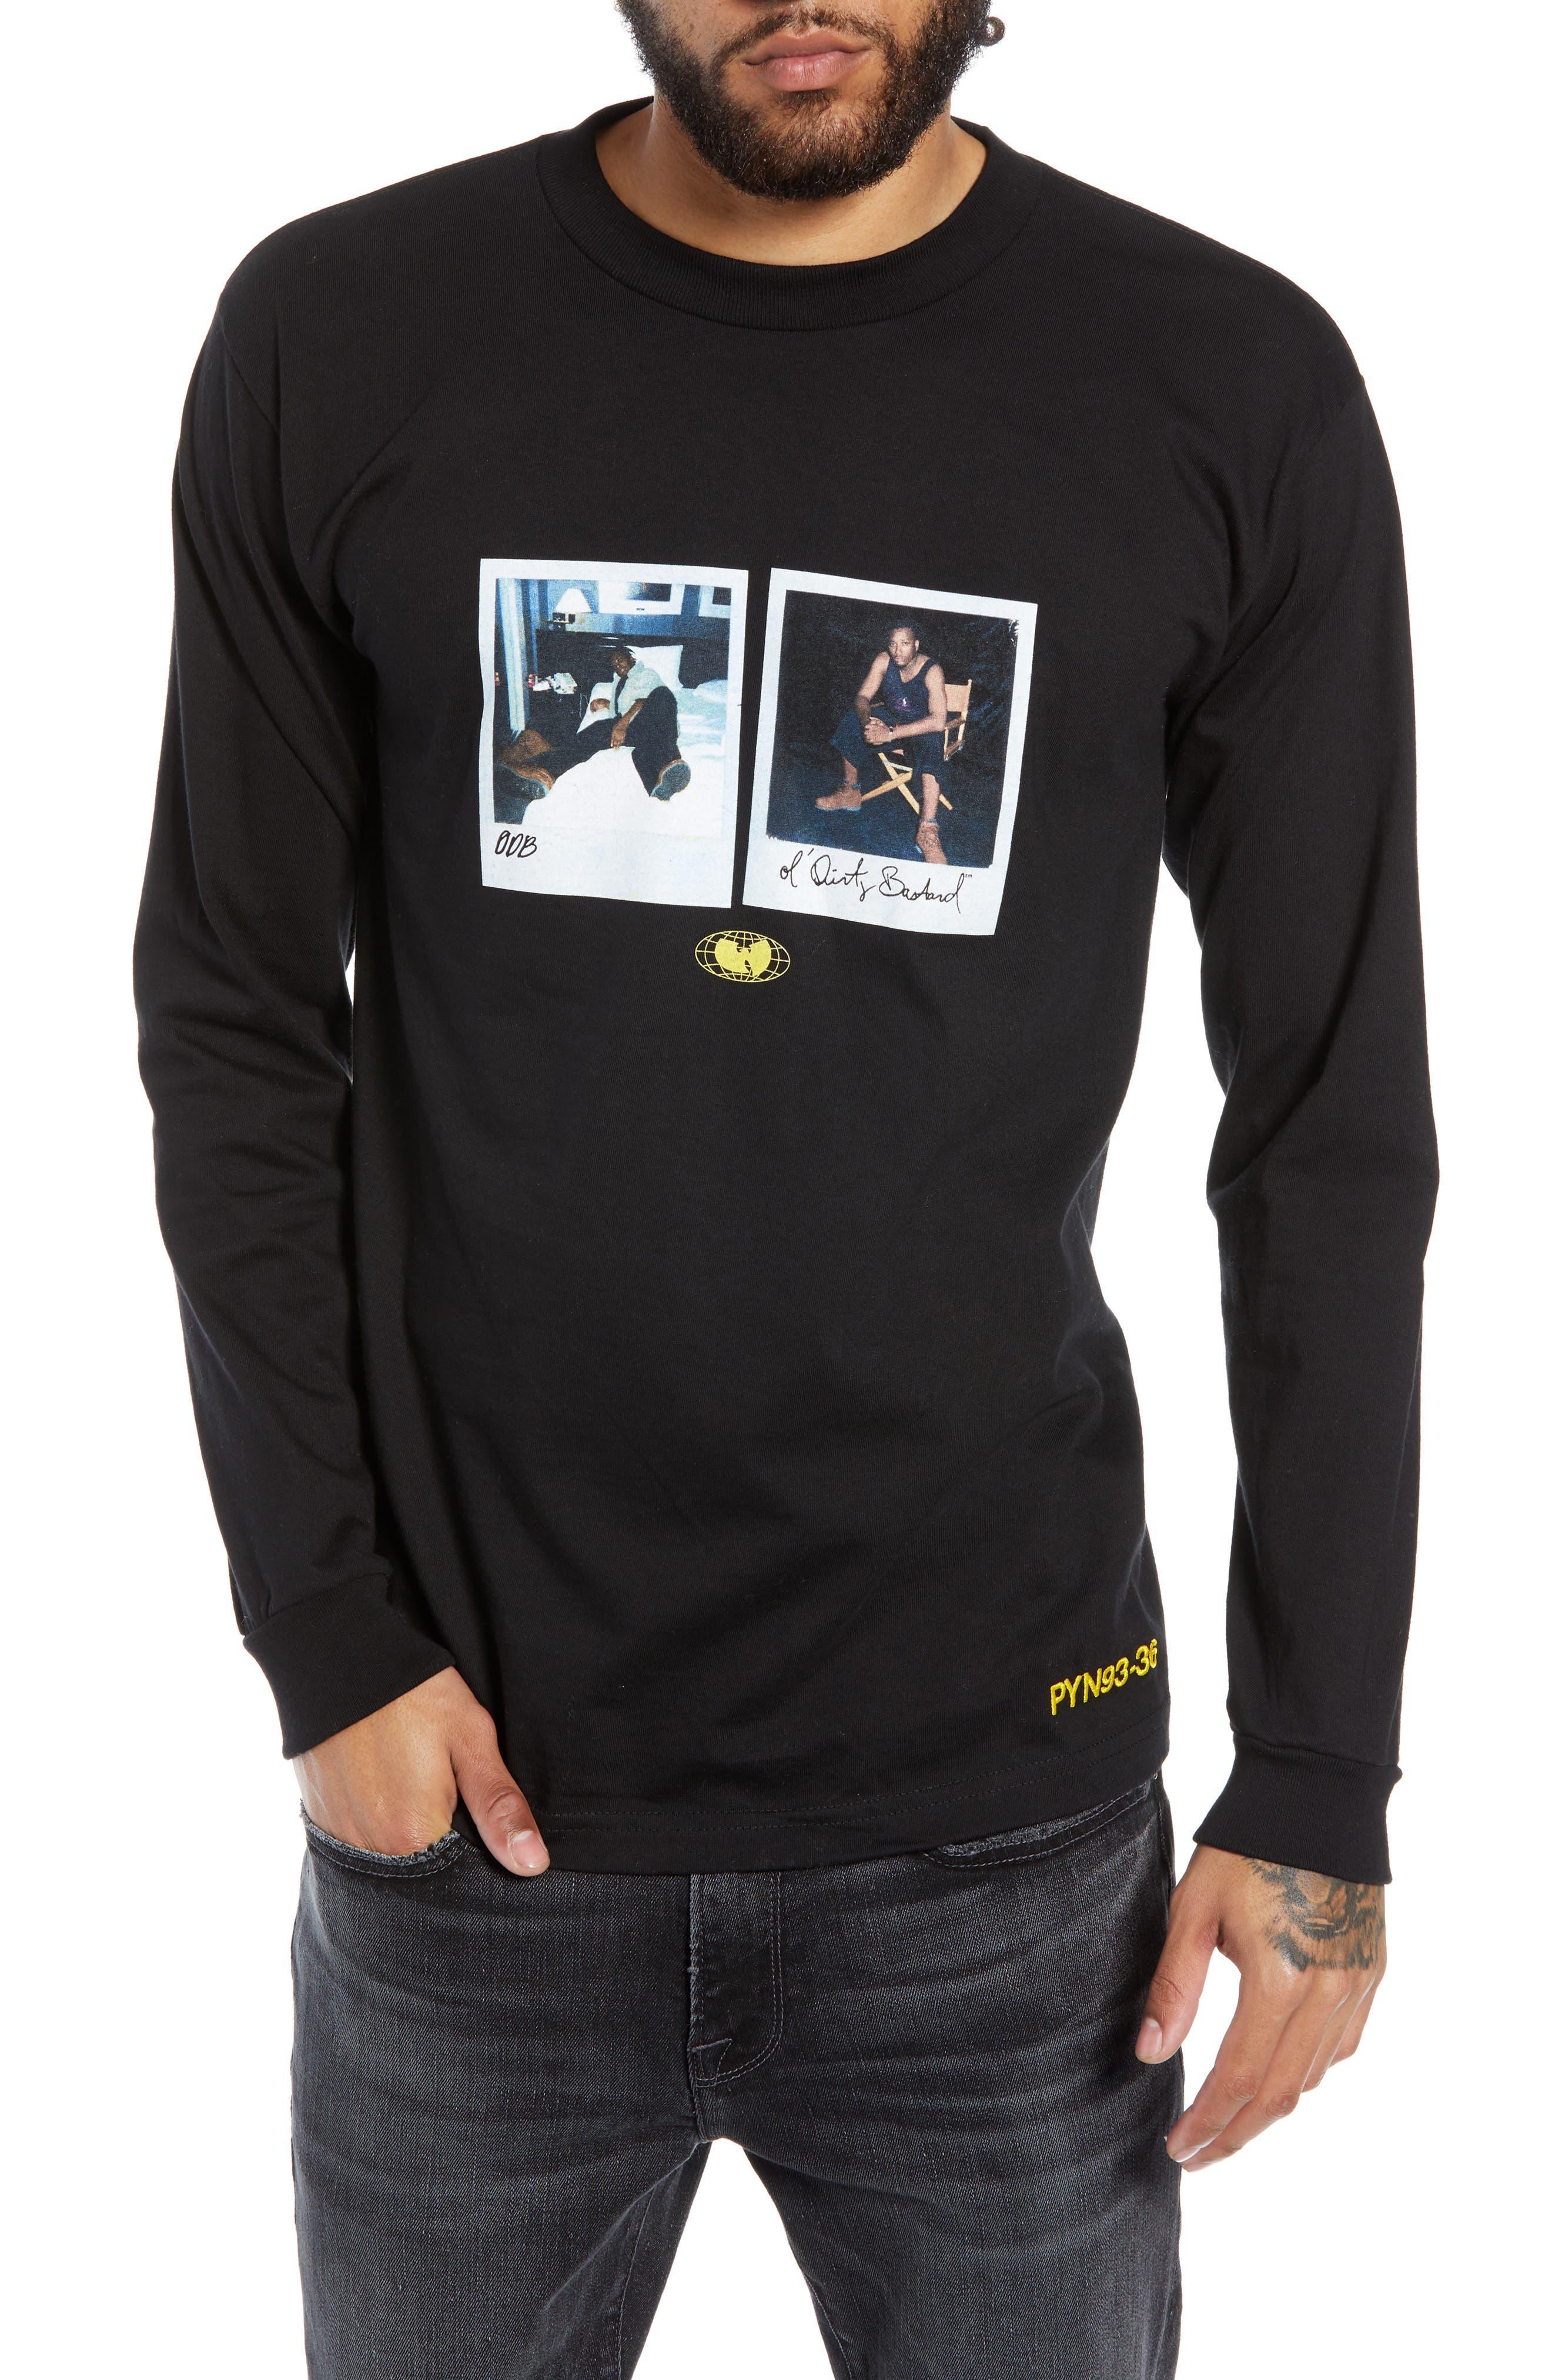 WU WEAR Odb Photo Graphic Long Sleeve T-Shirt in Black